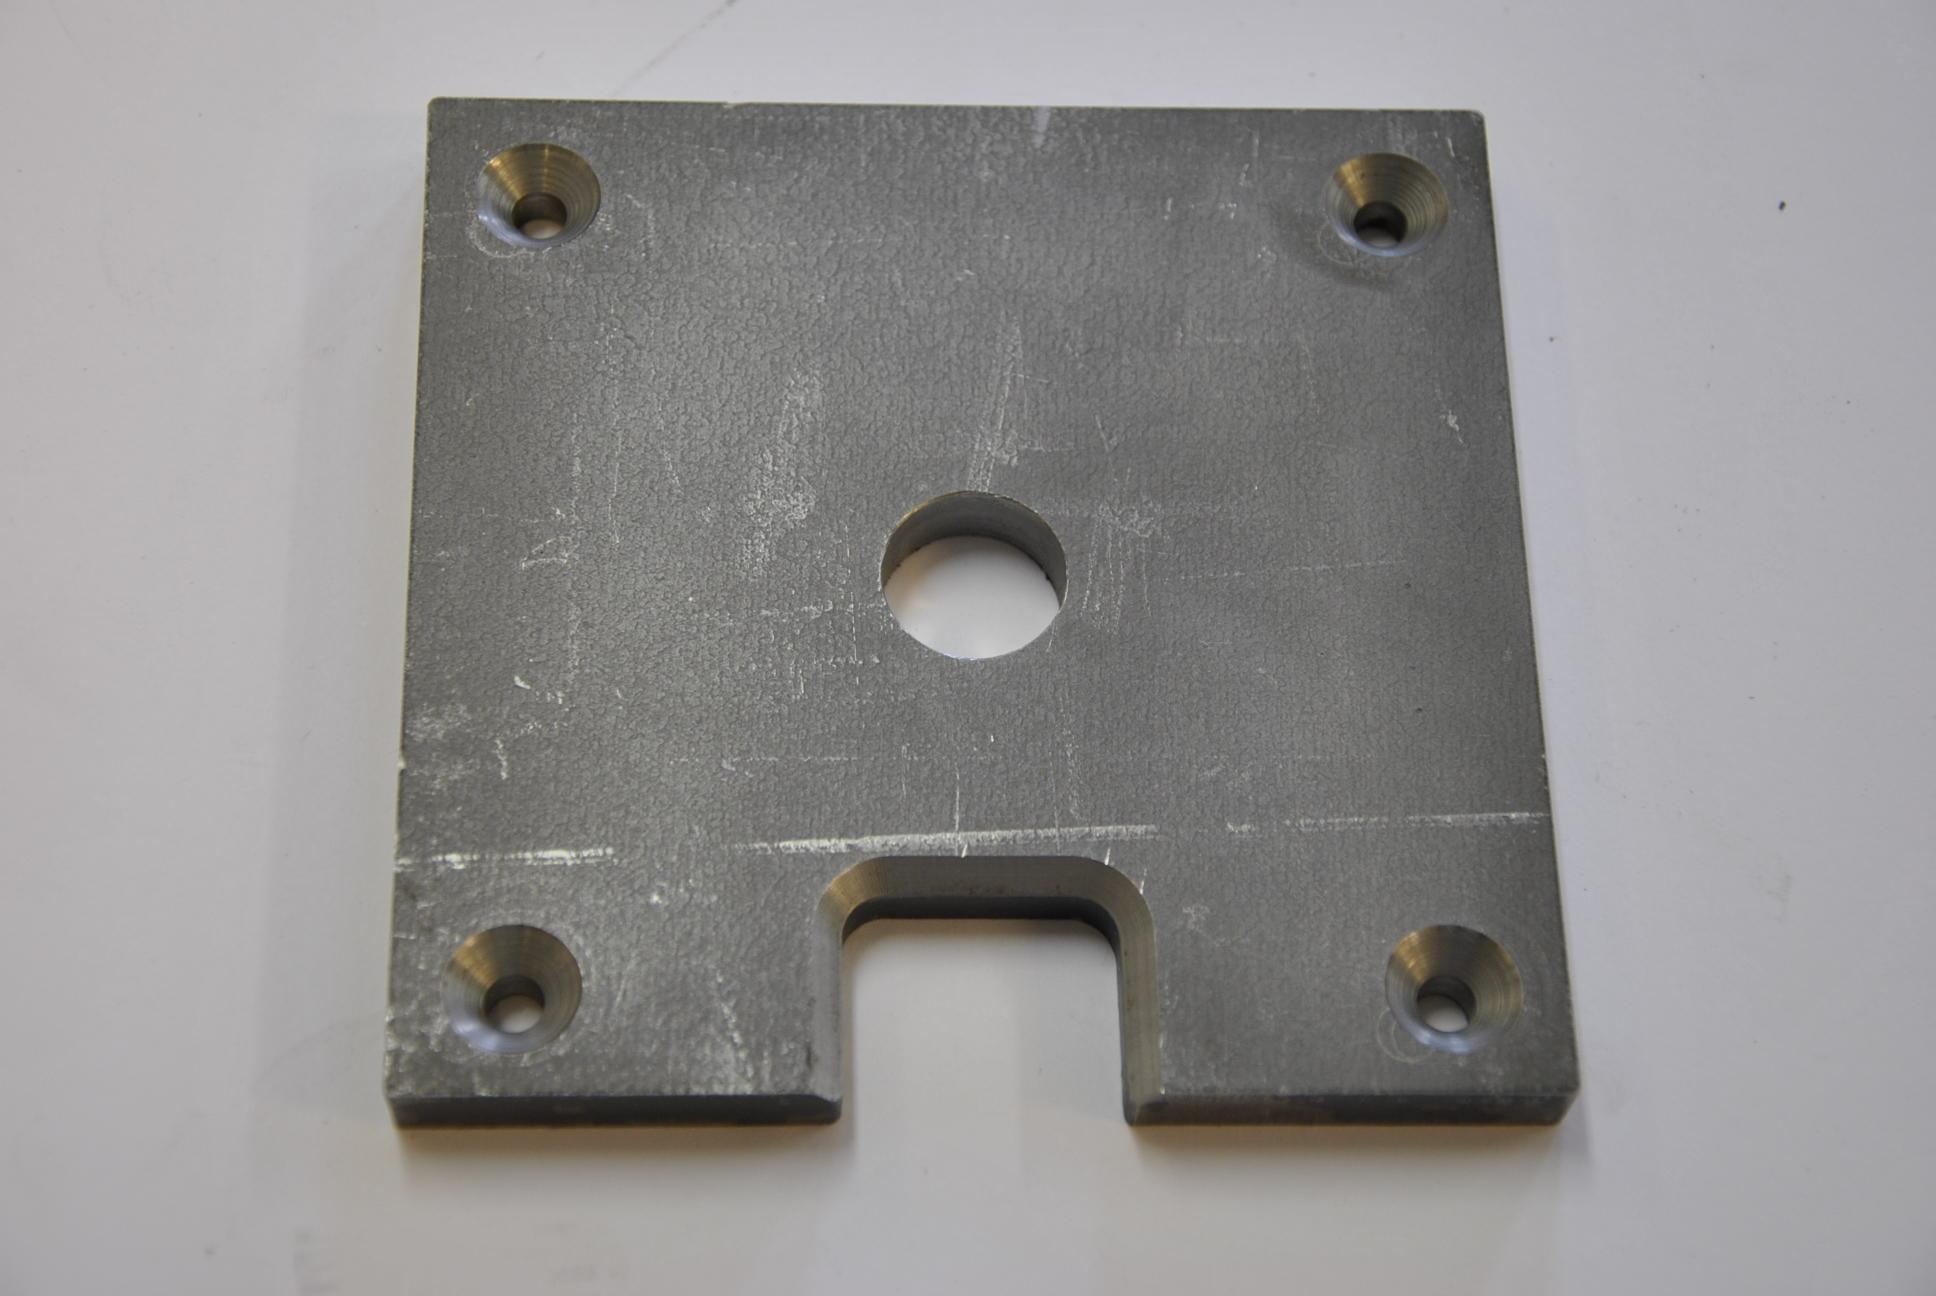 Пластина скручивающего устройства, верхняя. 4-5 шт/комп